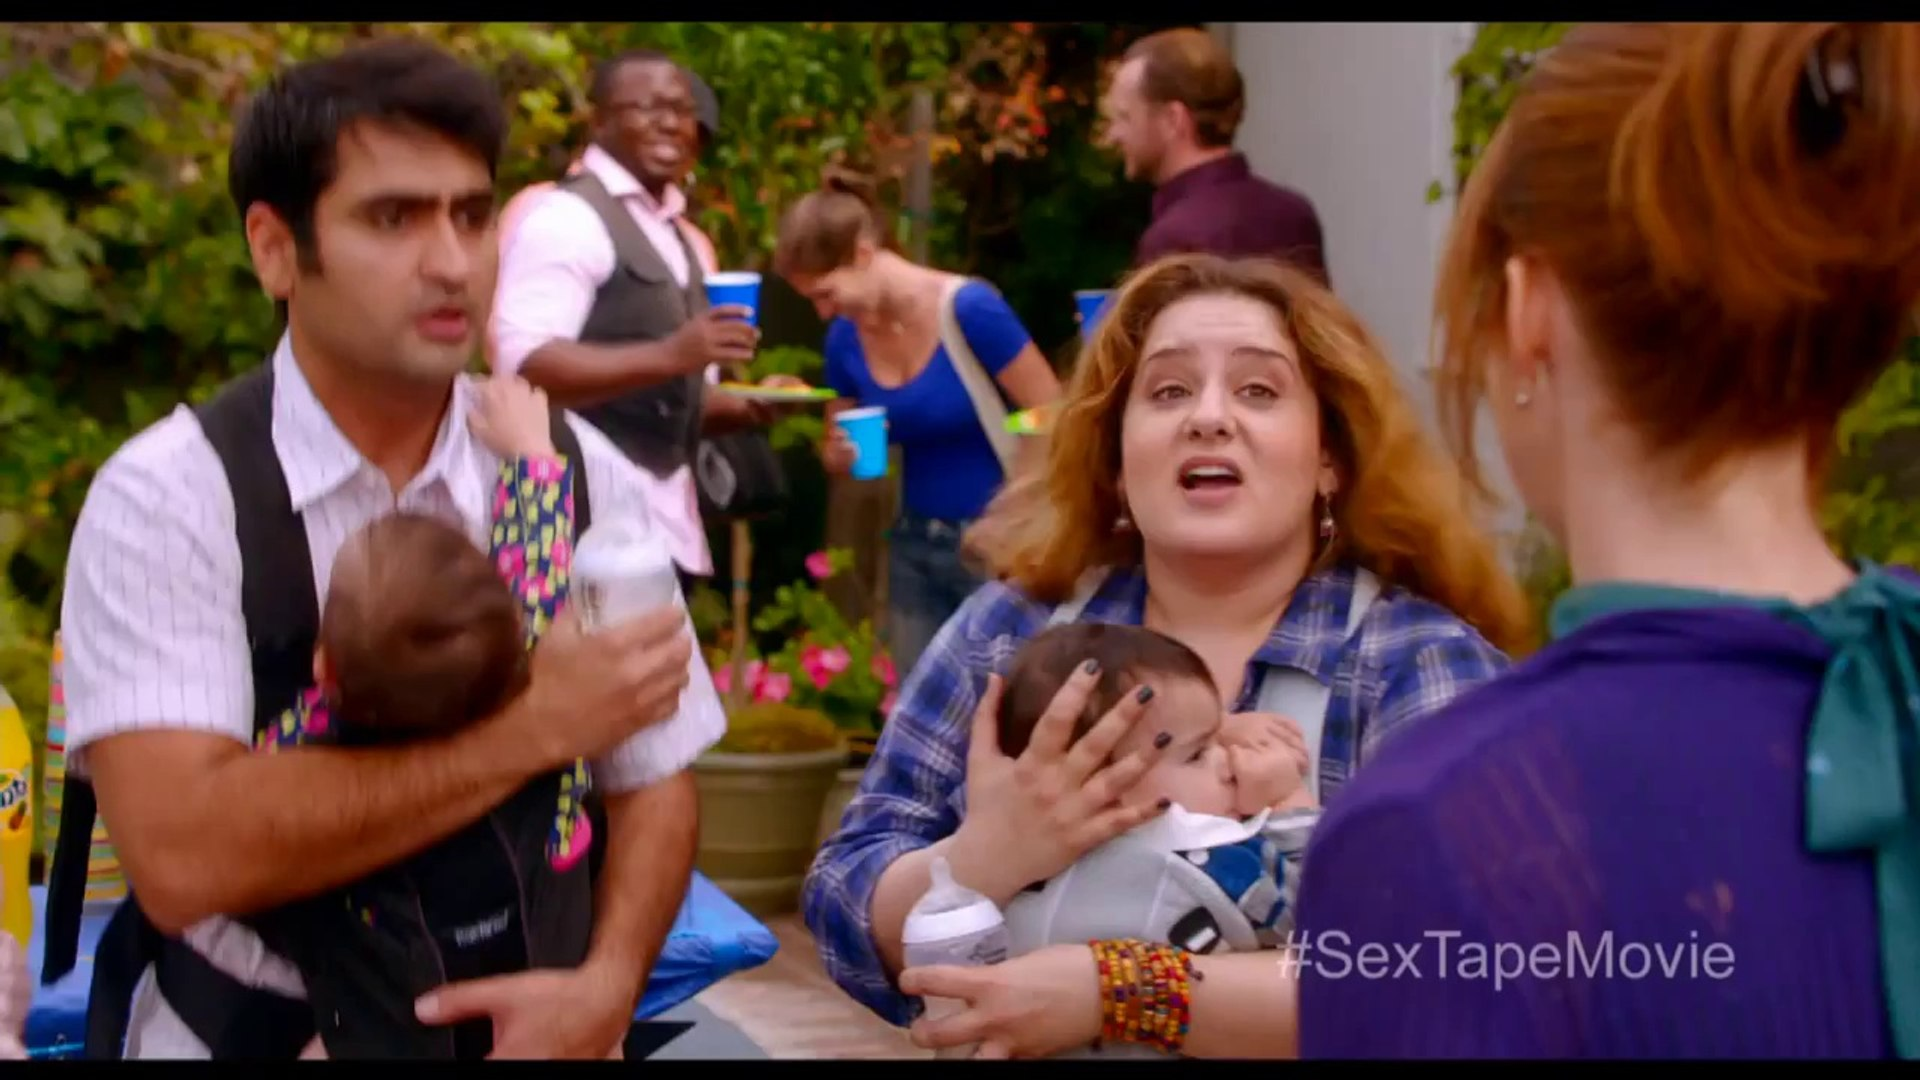 Sex Tape TV SPOT - Plan The Perfect Date Night (2014) - Jason Segel Raunchy Sex Comedy HD